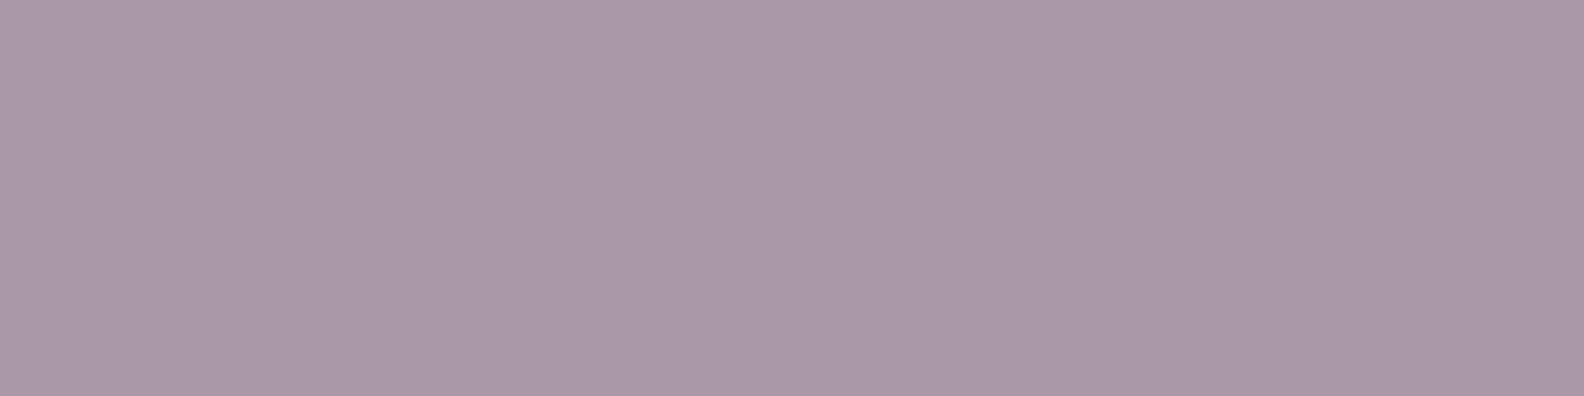 1584x396 Rose Quartz Solid Color Background